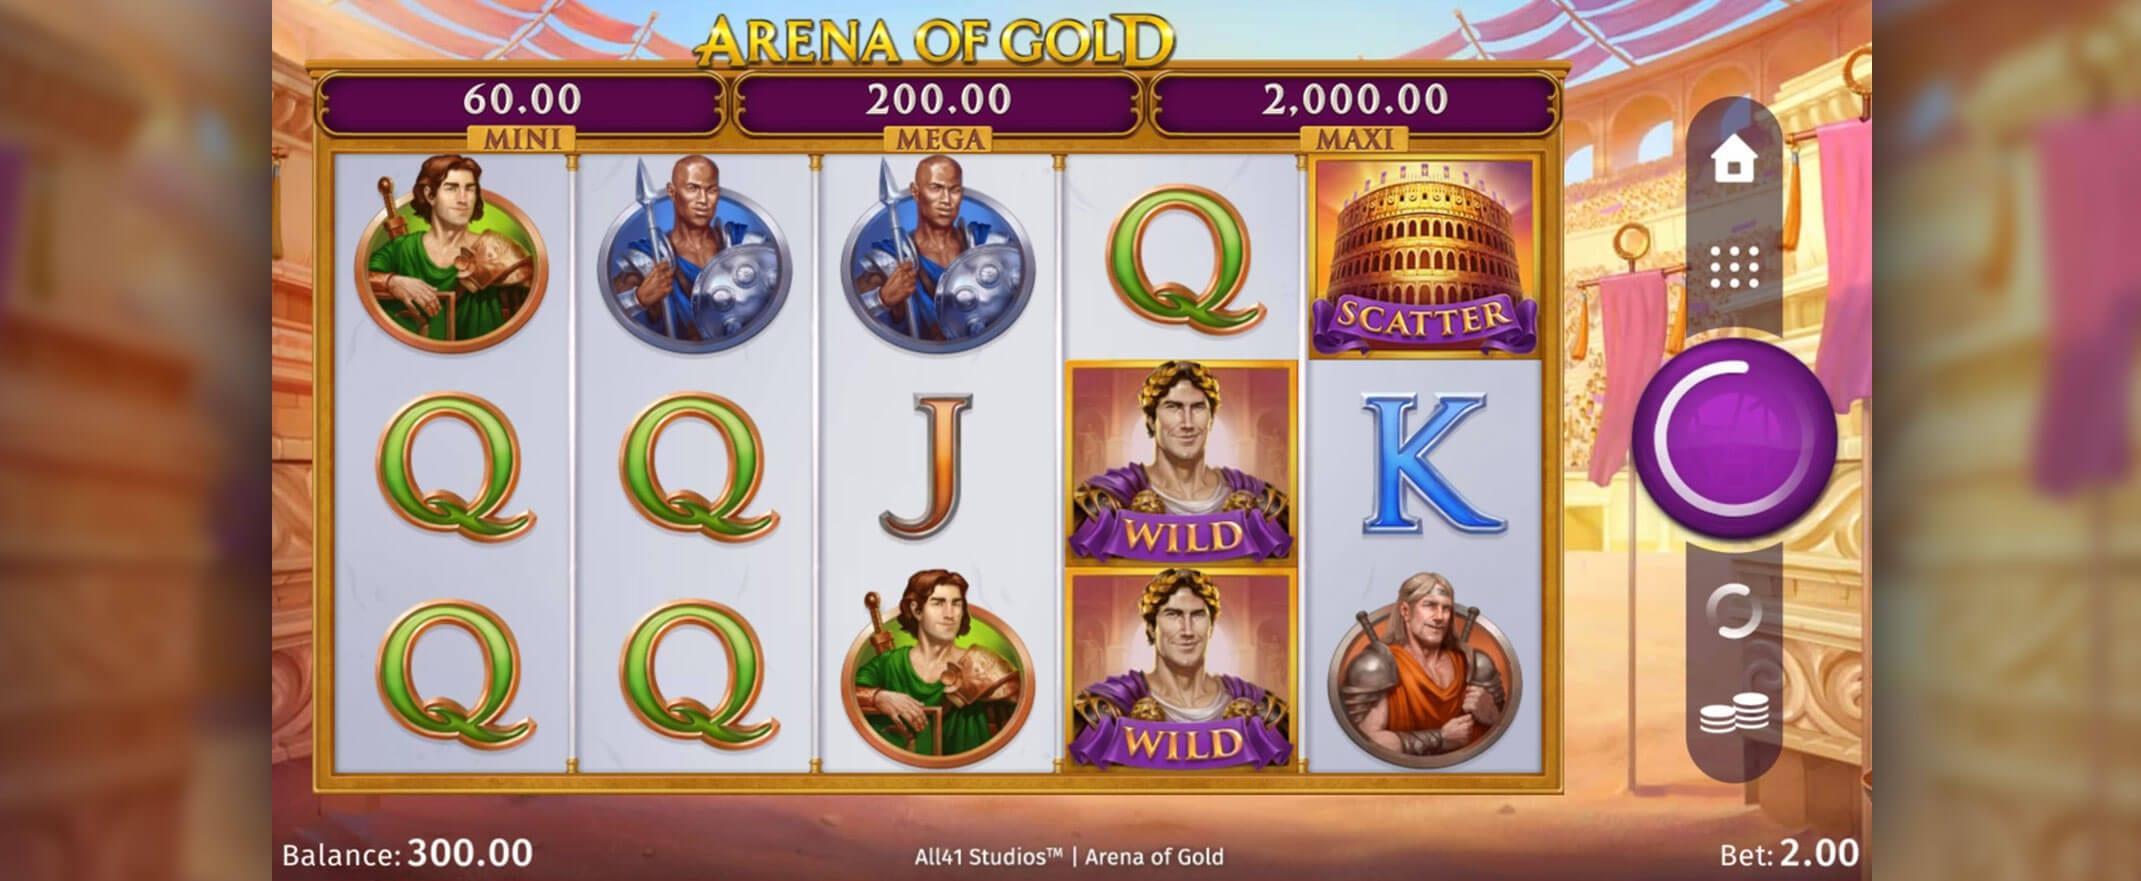 Arena of Gold Online Slots